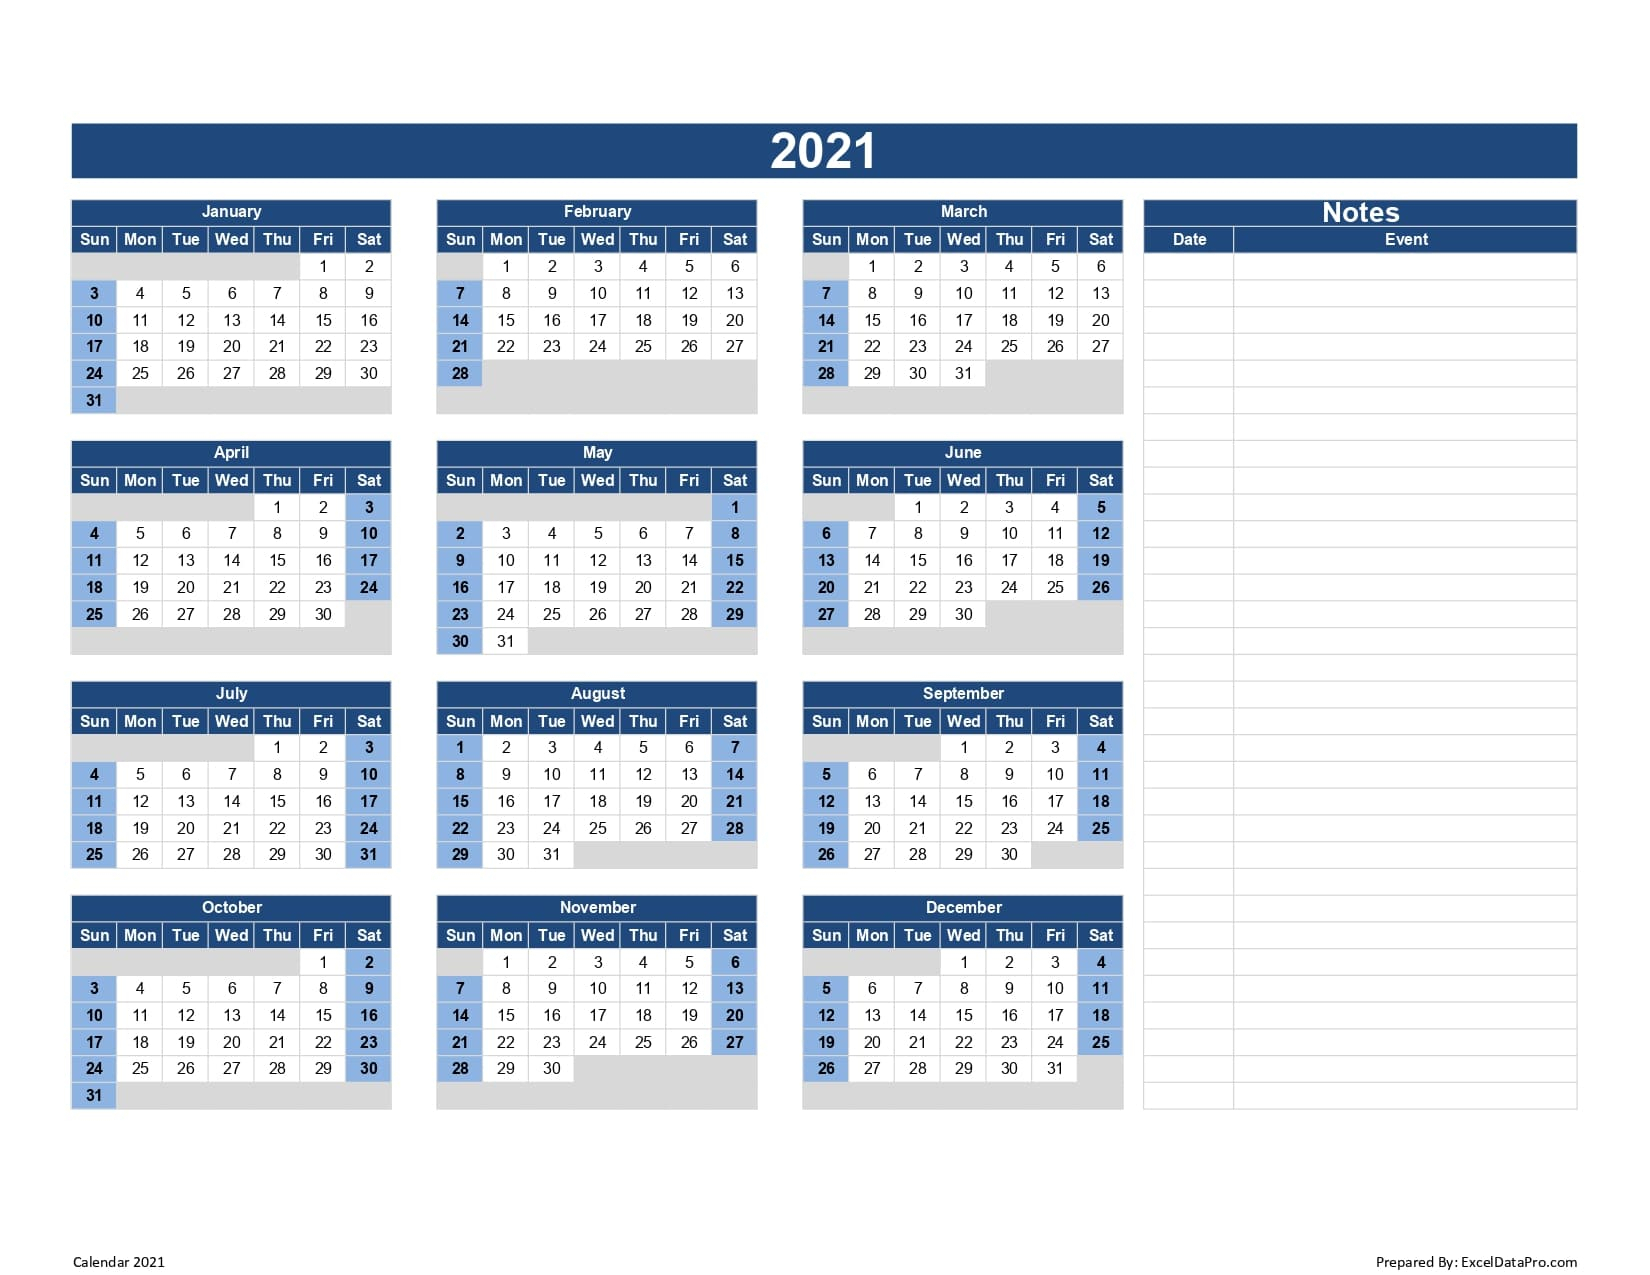 Payroll Calendar 2021 Excel - Printablecalendarsfor2021